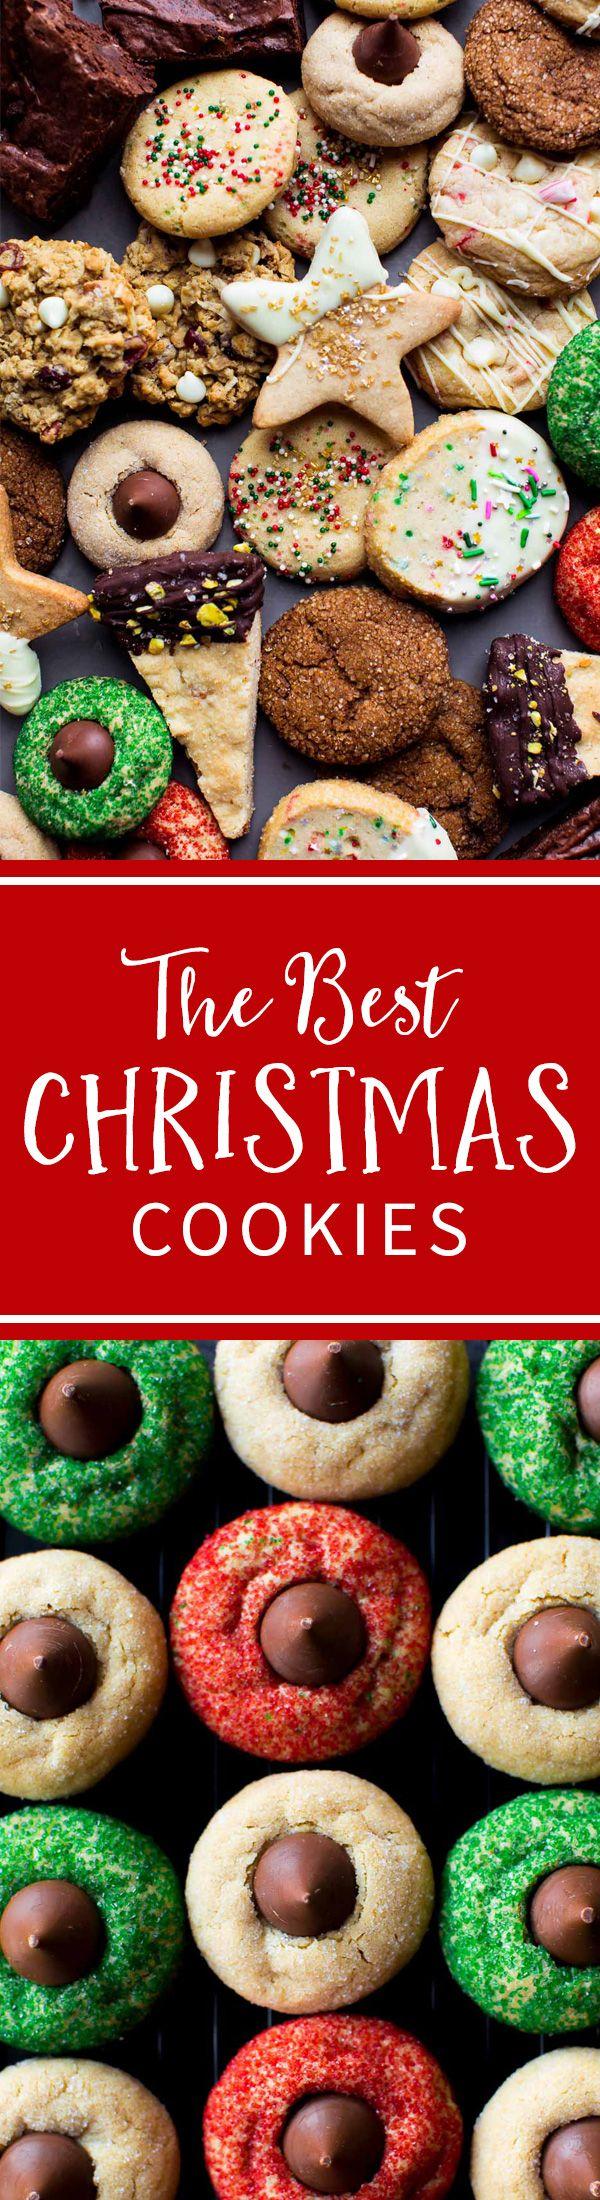 50+ fun and festive Christmas cookie recipes on sallysbakingaddiction.com